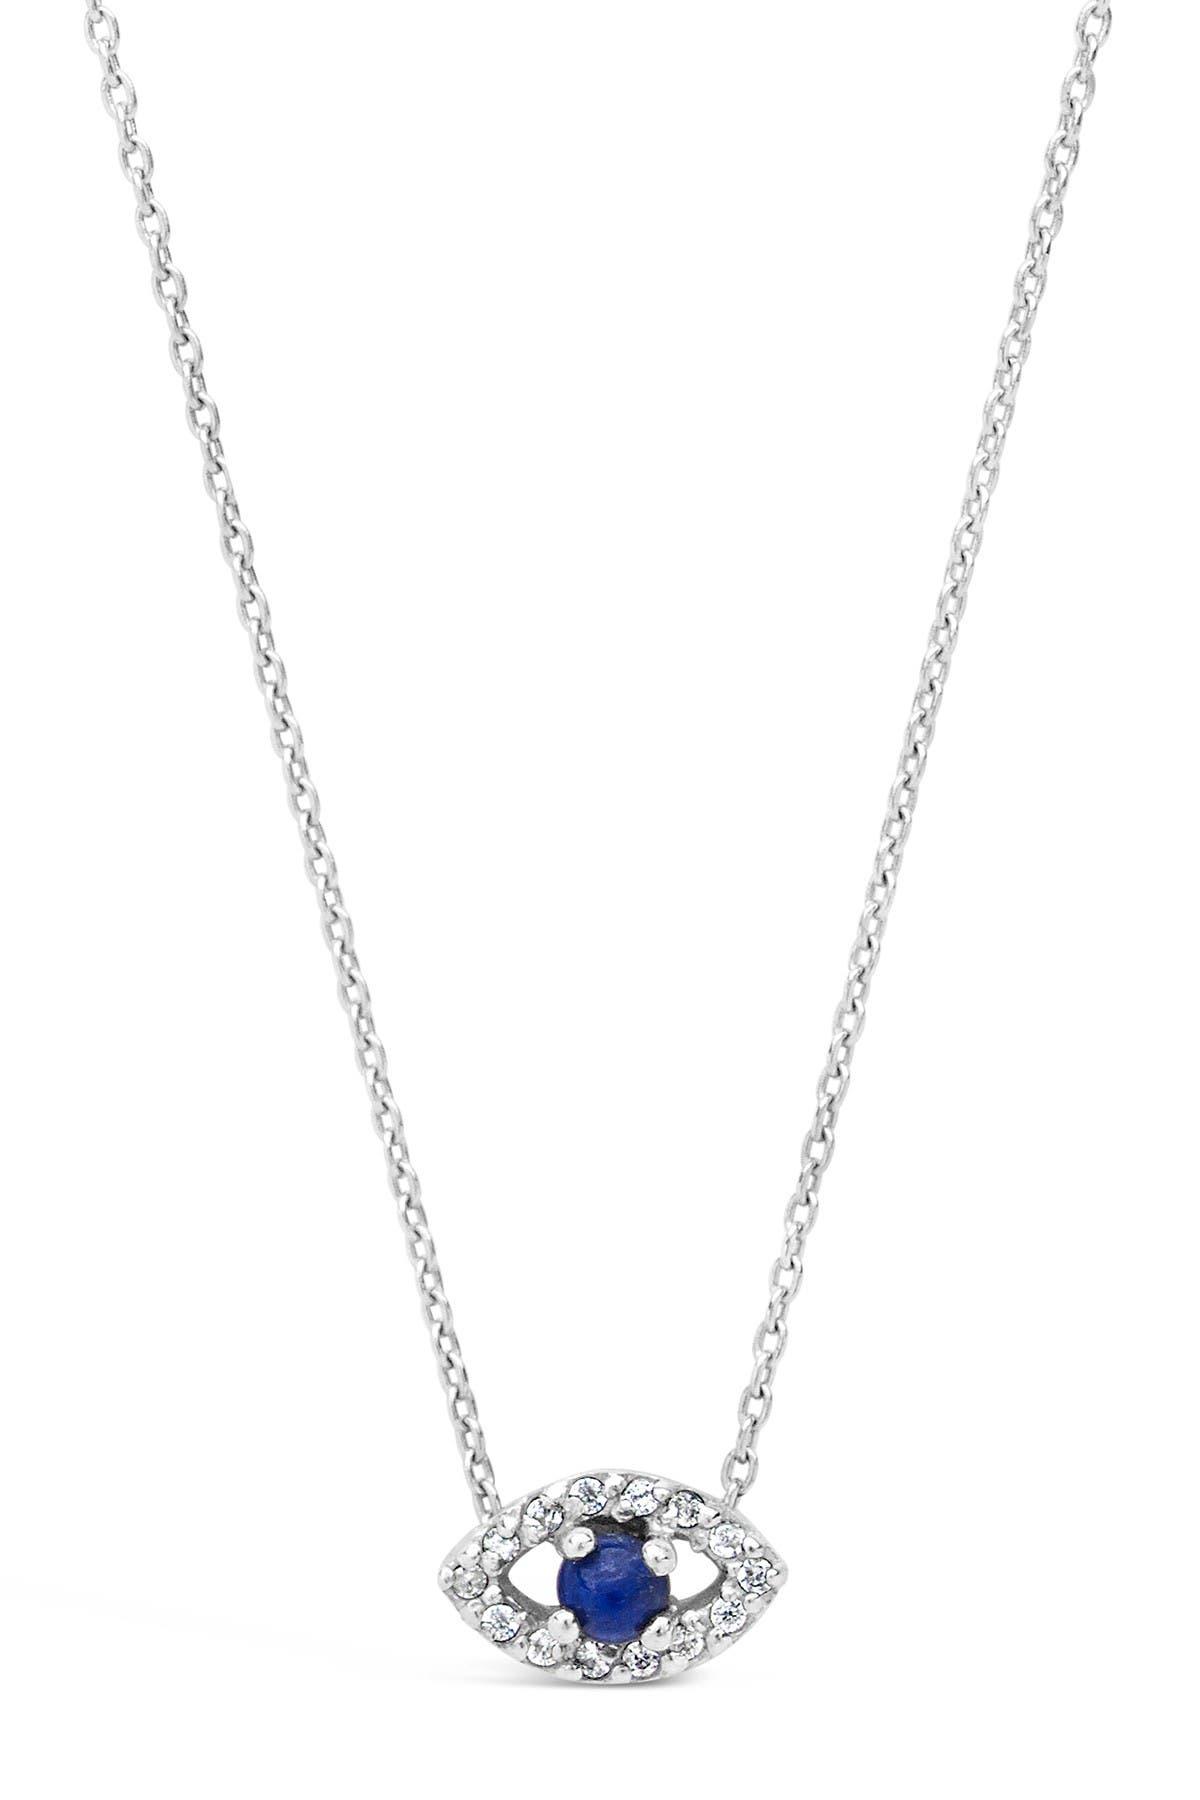 SilverLuxe Womens Sterling Silver CZ Evil Eye Disc Pendant Necklace 15 2